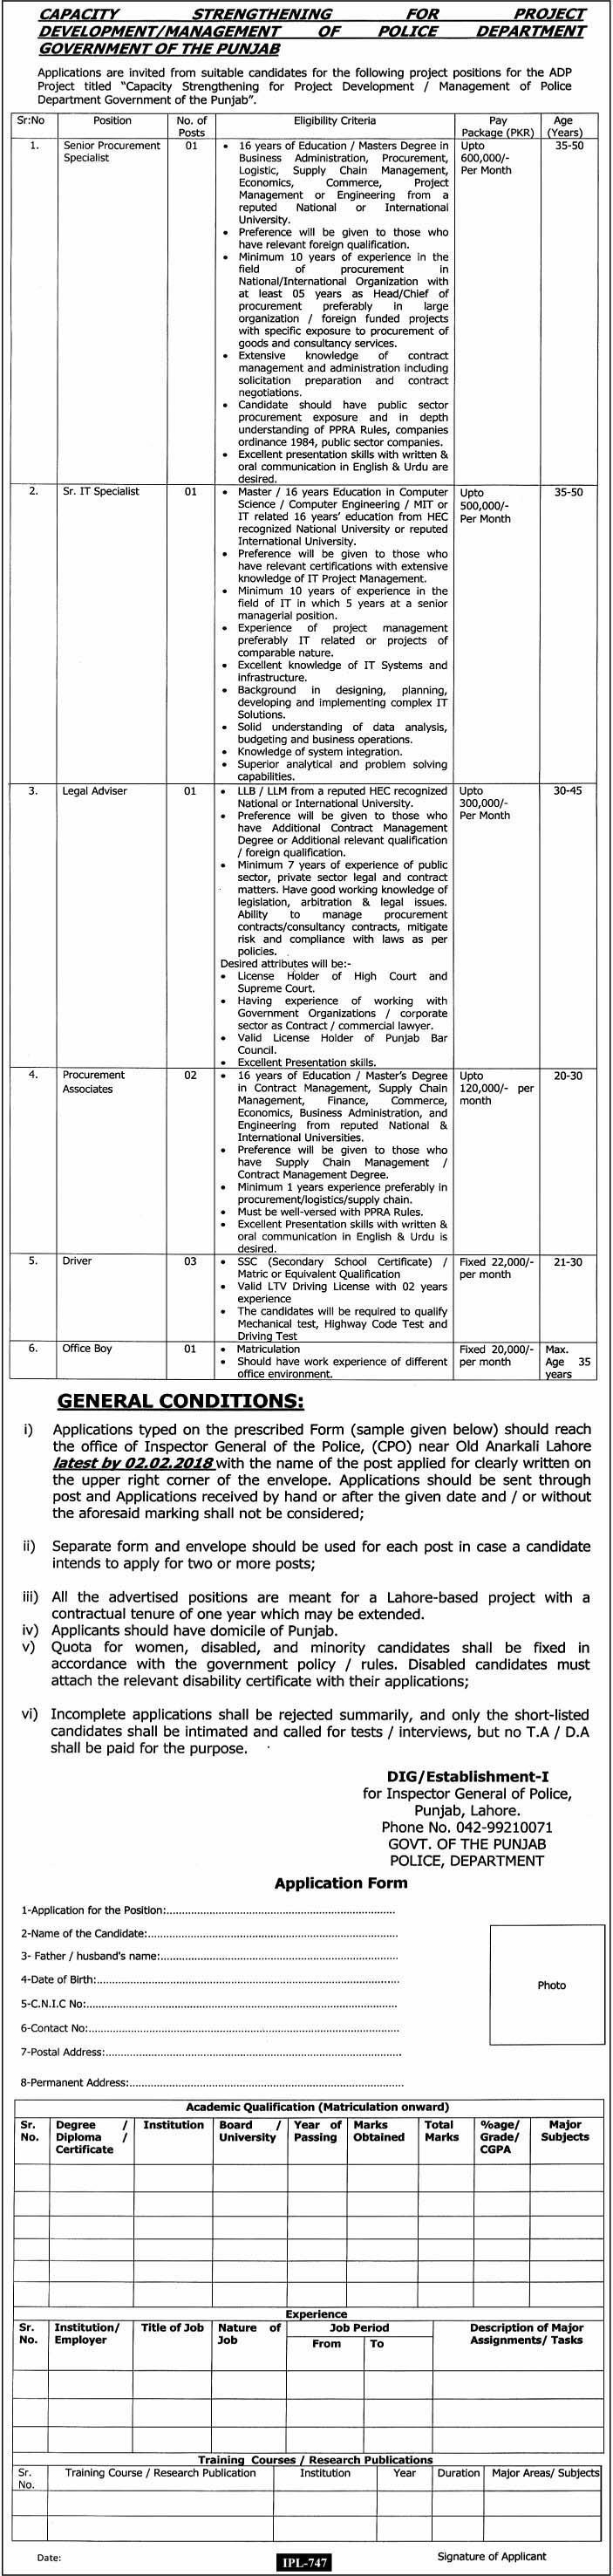 Govt. of the Punjab, Punjab Police 09 Jobs, 17 January 2018 Daily Express Newspaper